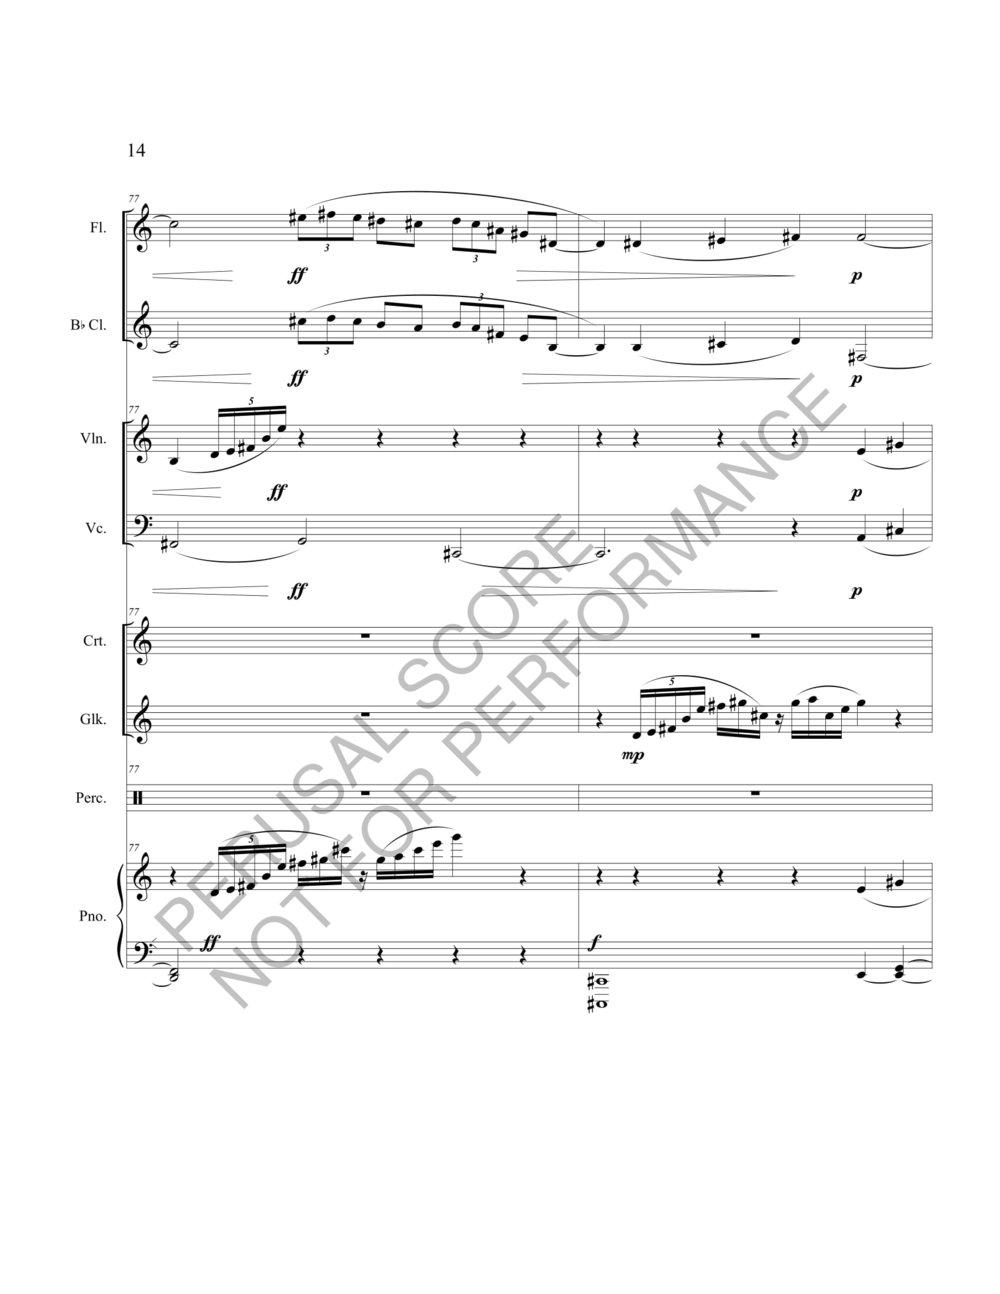 Boyd Terra Liberi Score-watermark-20.jpg